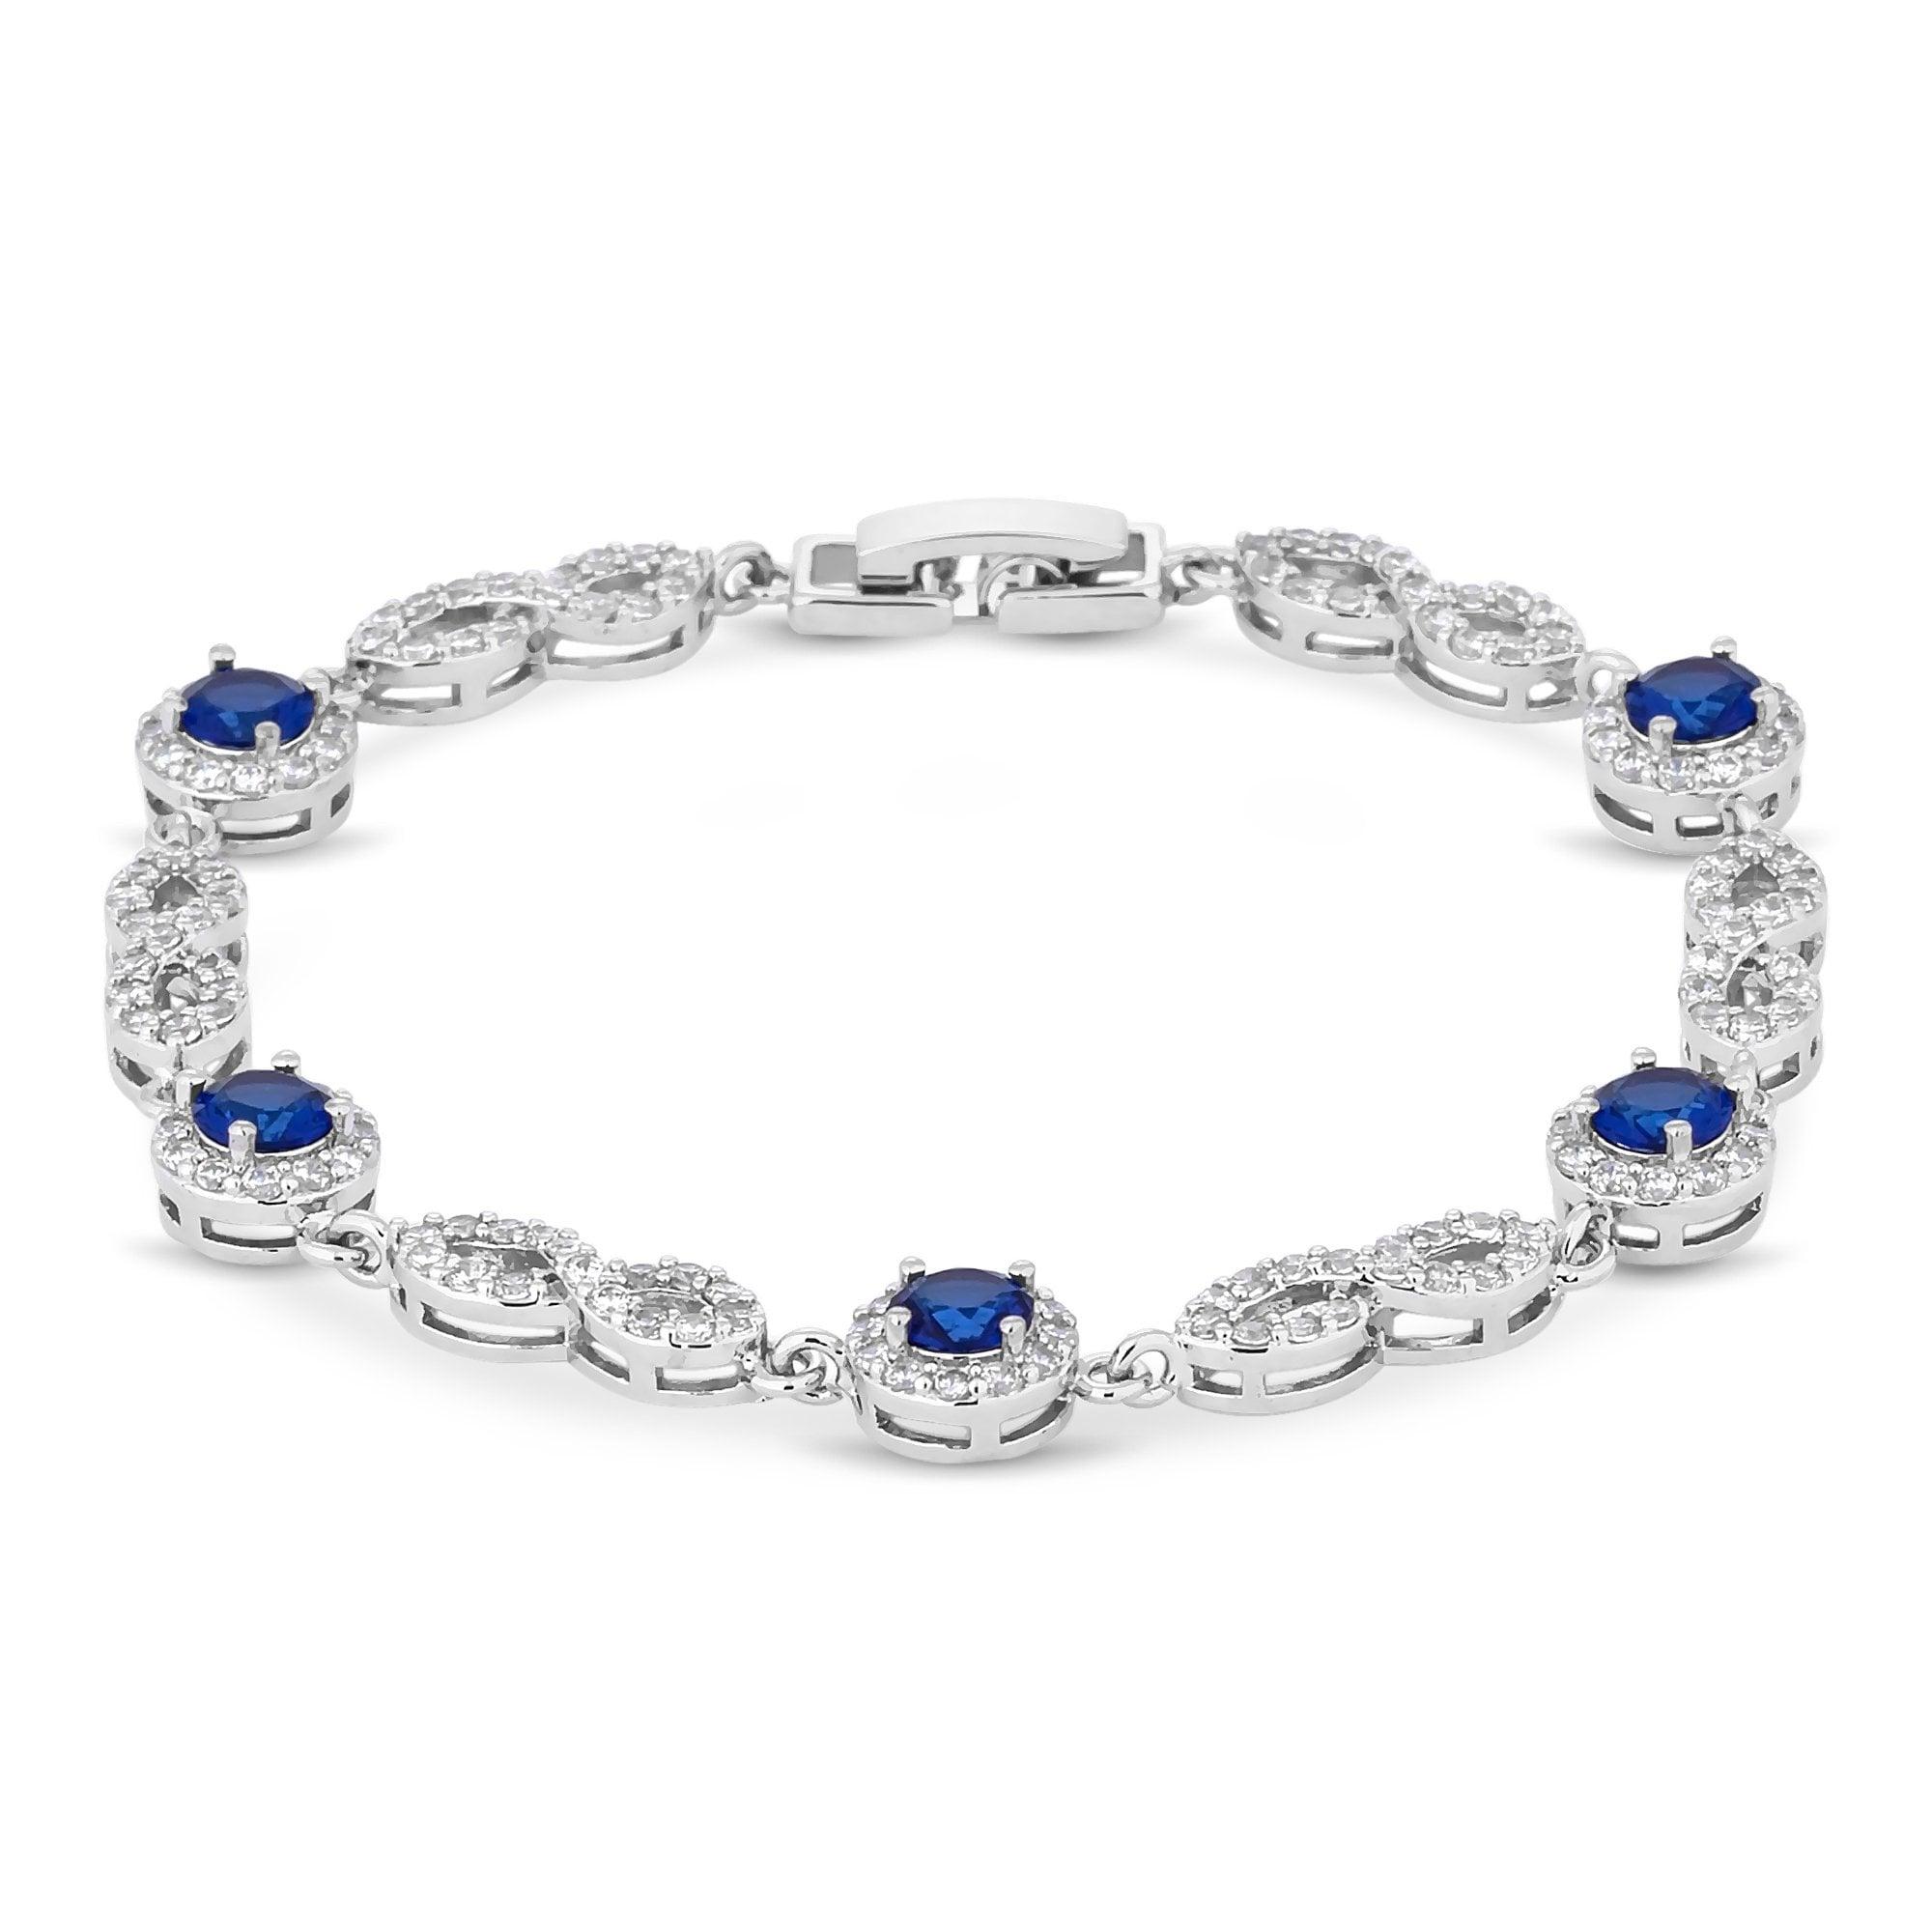 Jon Richard-Silver plated blue cubic zirconia montana infinity pear drop bracelet - £15 @ Debenhams Free C&C